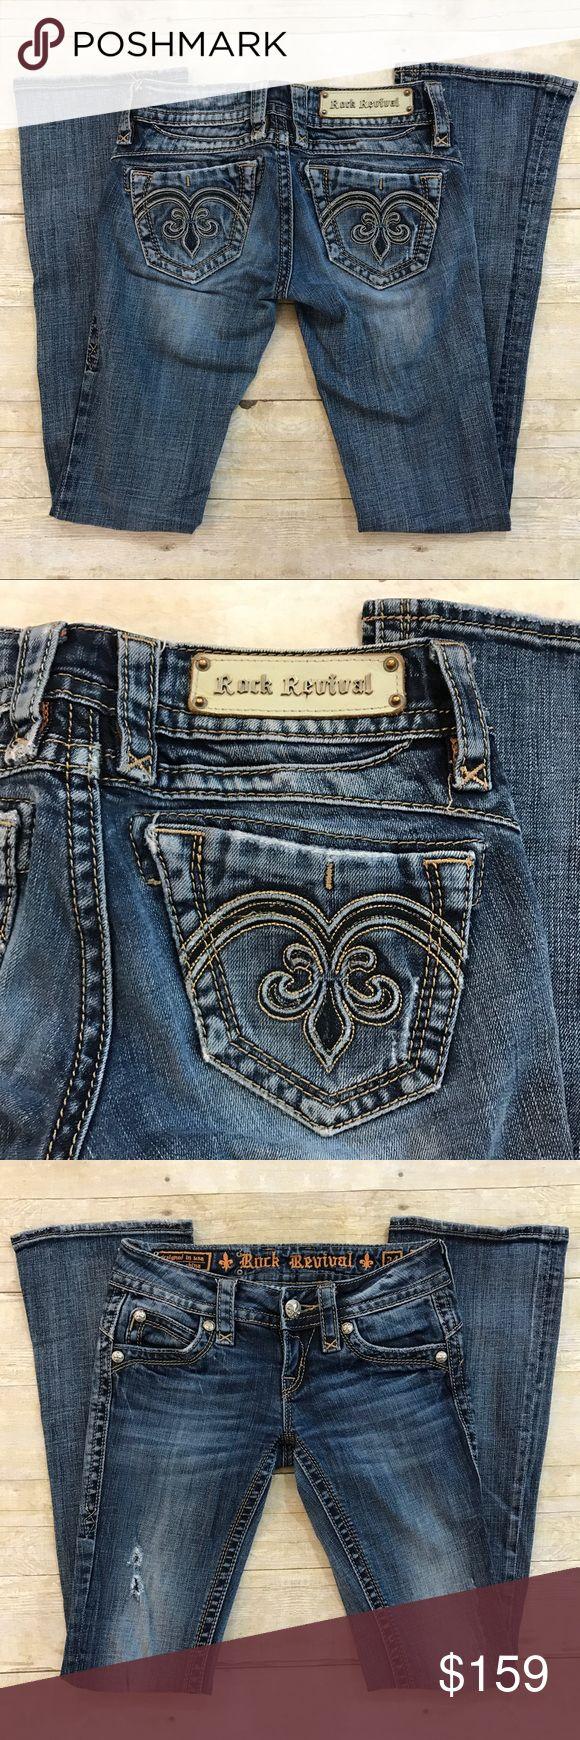 "😍Rock Revival Adele boot cut jeans Rock revival Adele boot cut jeans. Inseam about 32"". Size 24. Rock Revival Jeans Boot Cut"